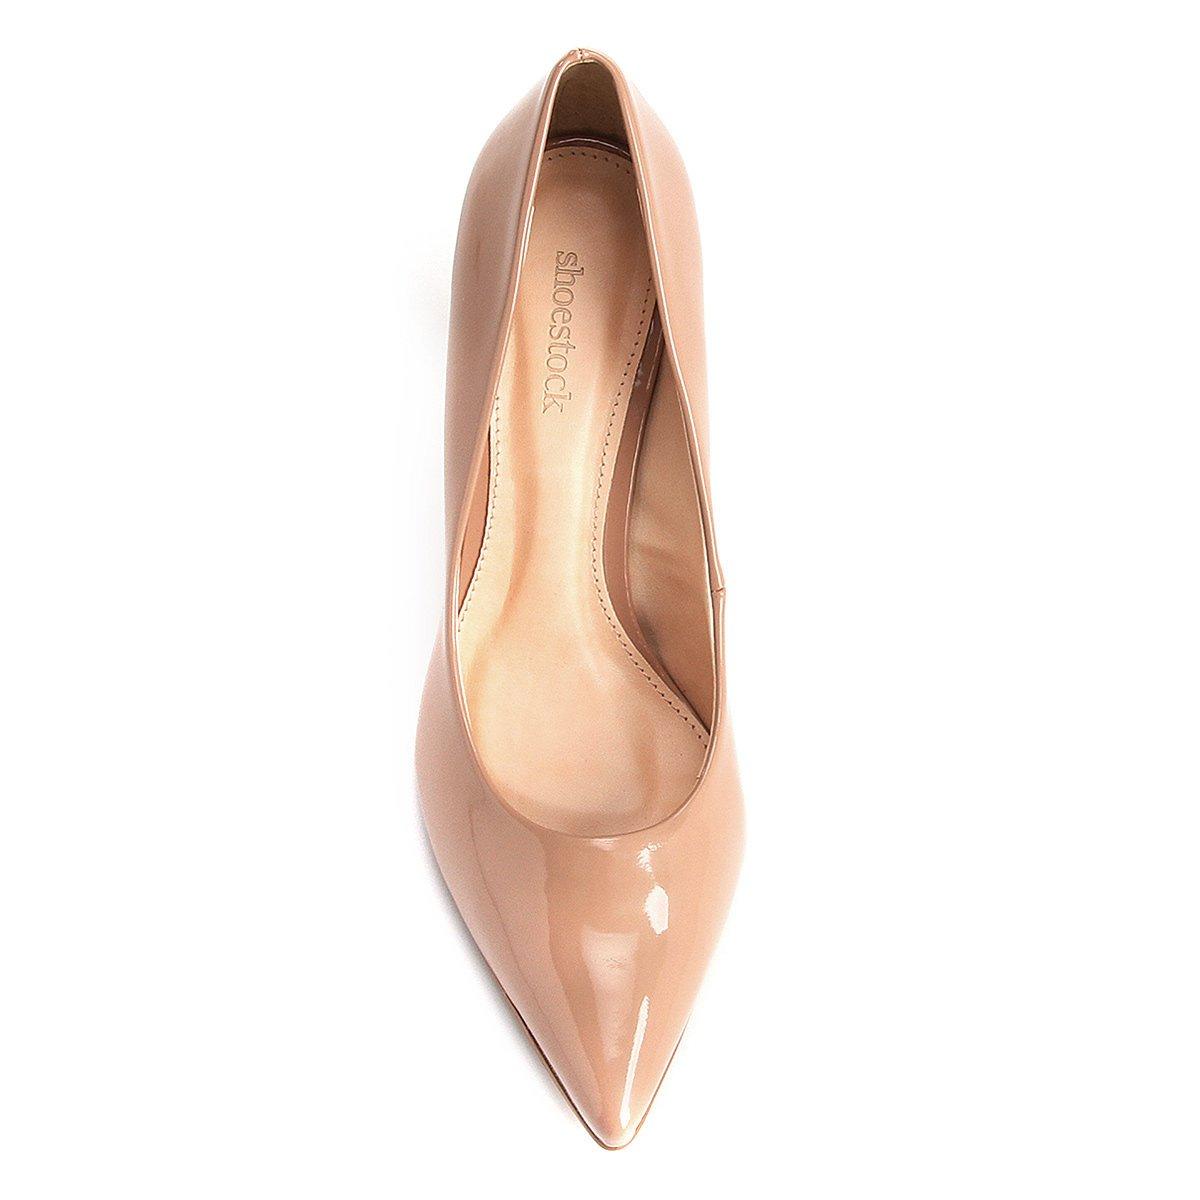 Scarpin Salto Claro Rosa Alto Shoestock Scarpin Shoestock Cone aSfq5tw